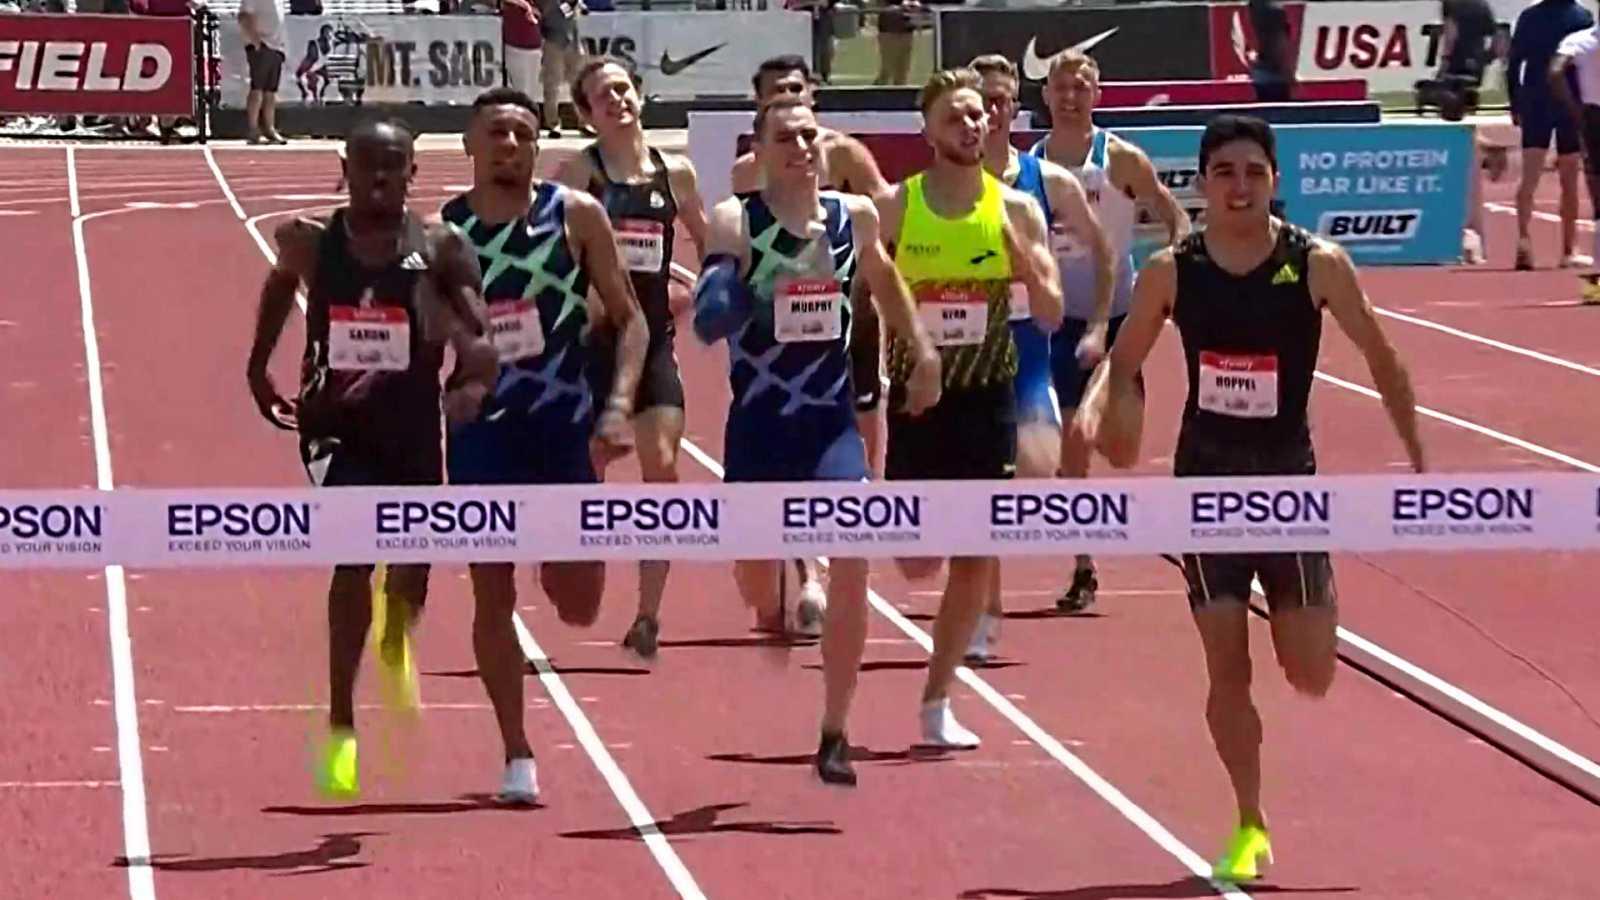 "Atletismo - IAAF Continental Tour ""Usatf Golden Games"" - ver ahora"